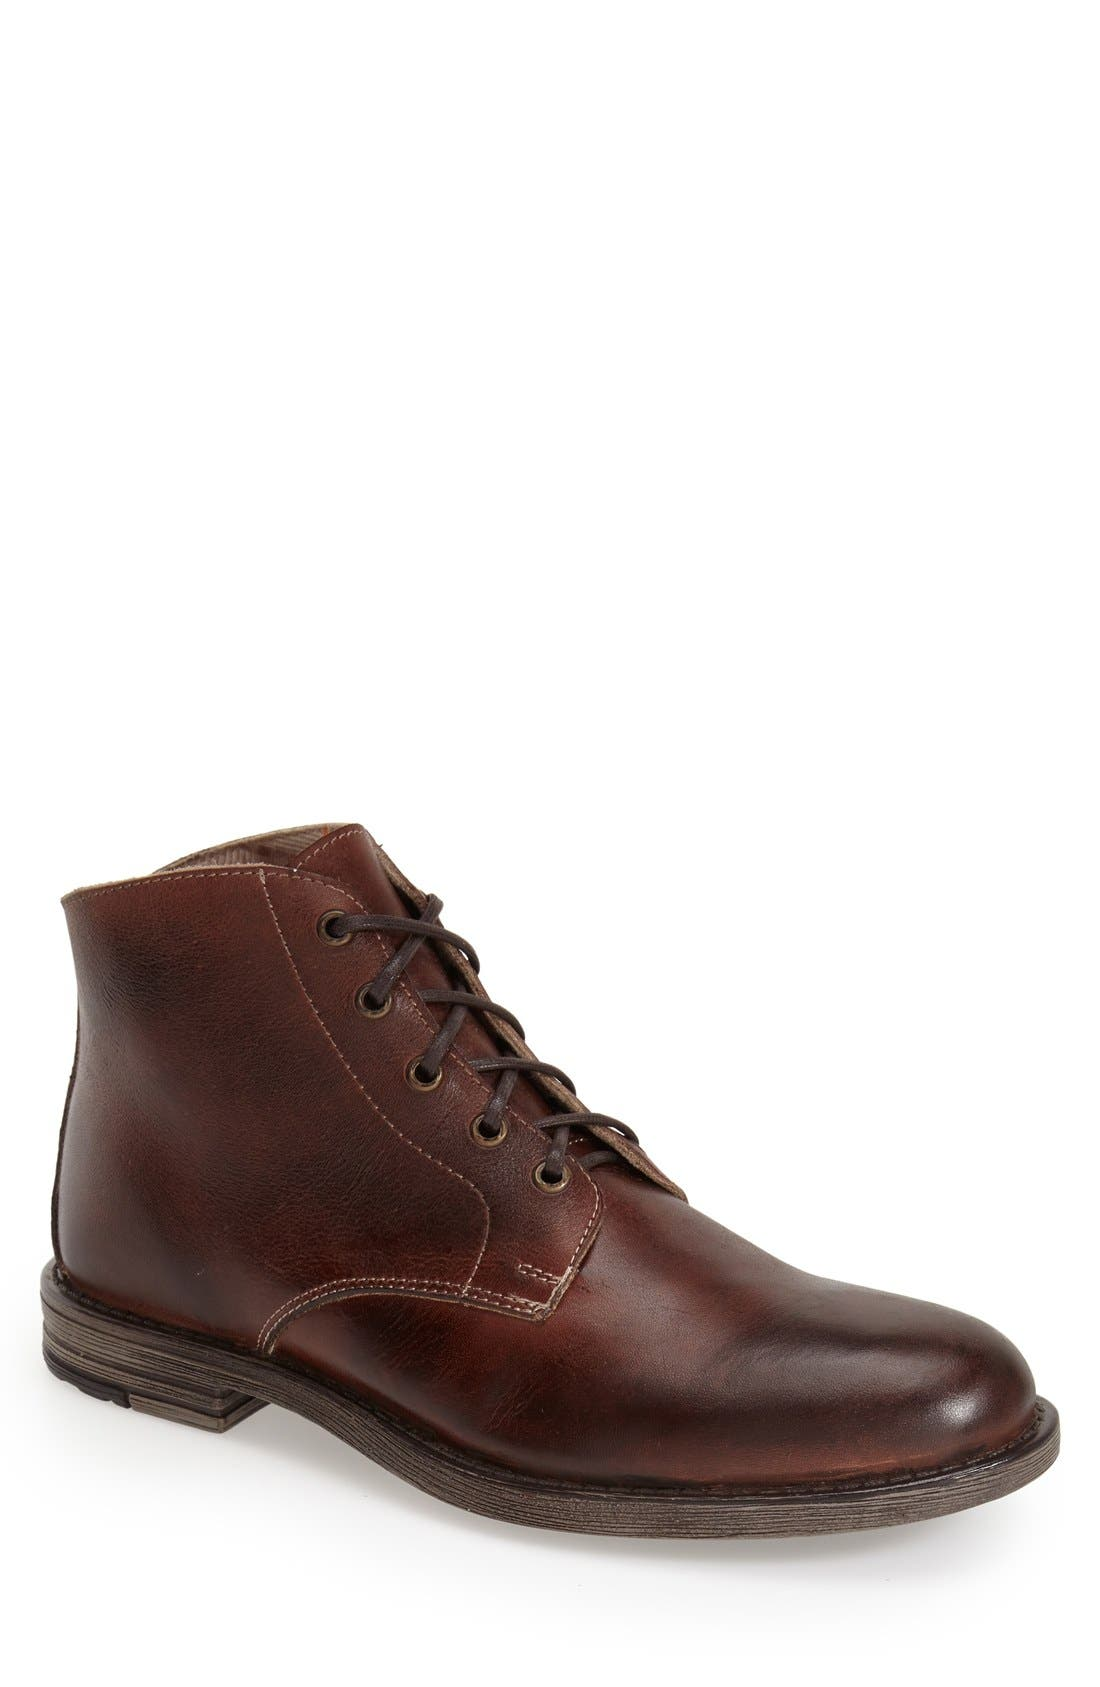 Alternate Image 1 Selected - Bed Stu 'Hoover' Boot (Men)